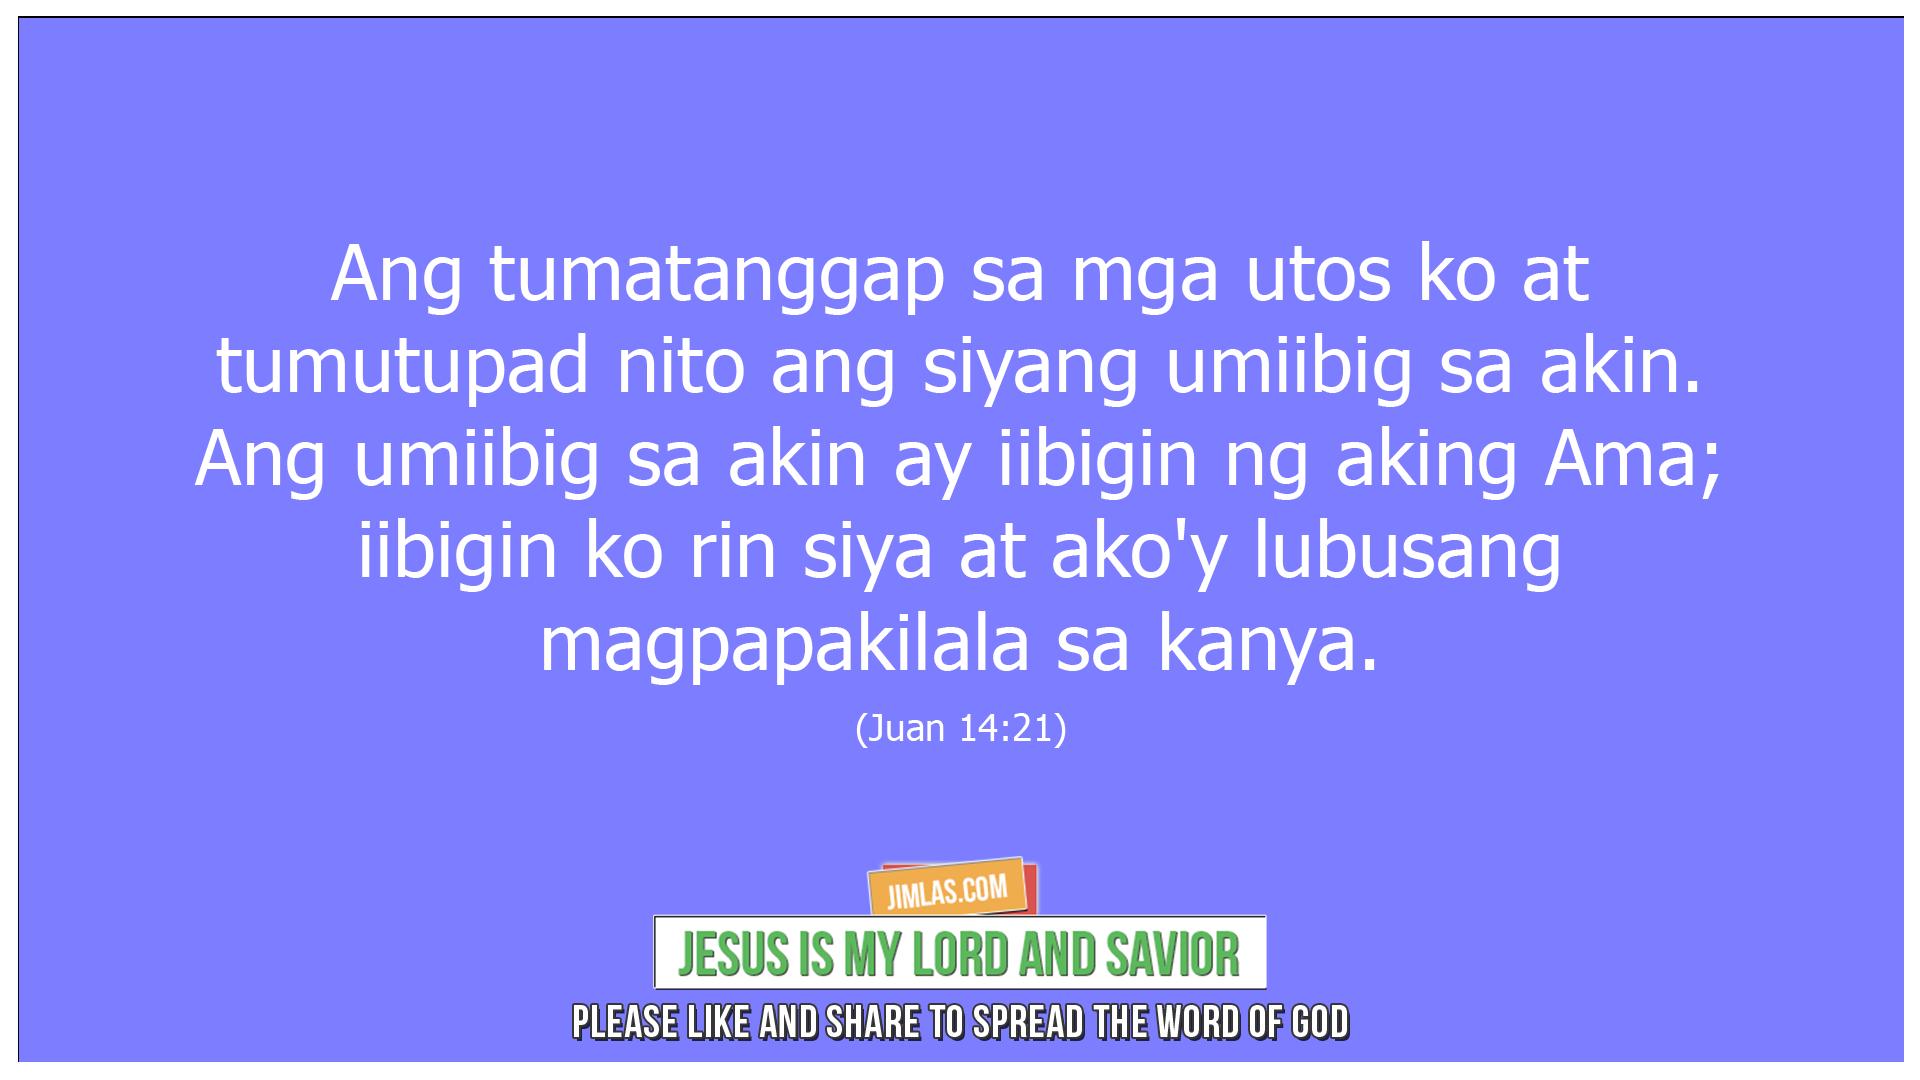 juan 14 21, Juan 14:21